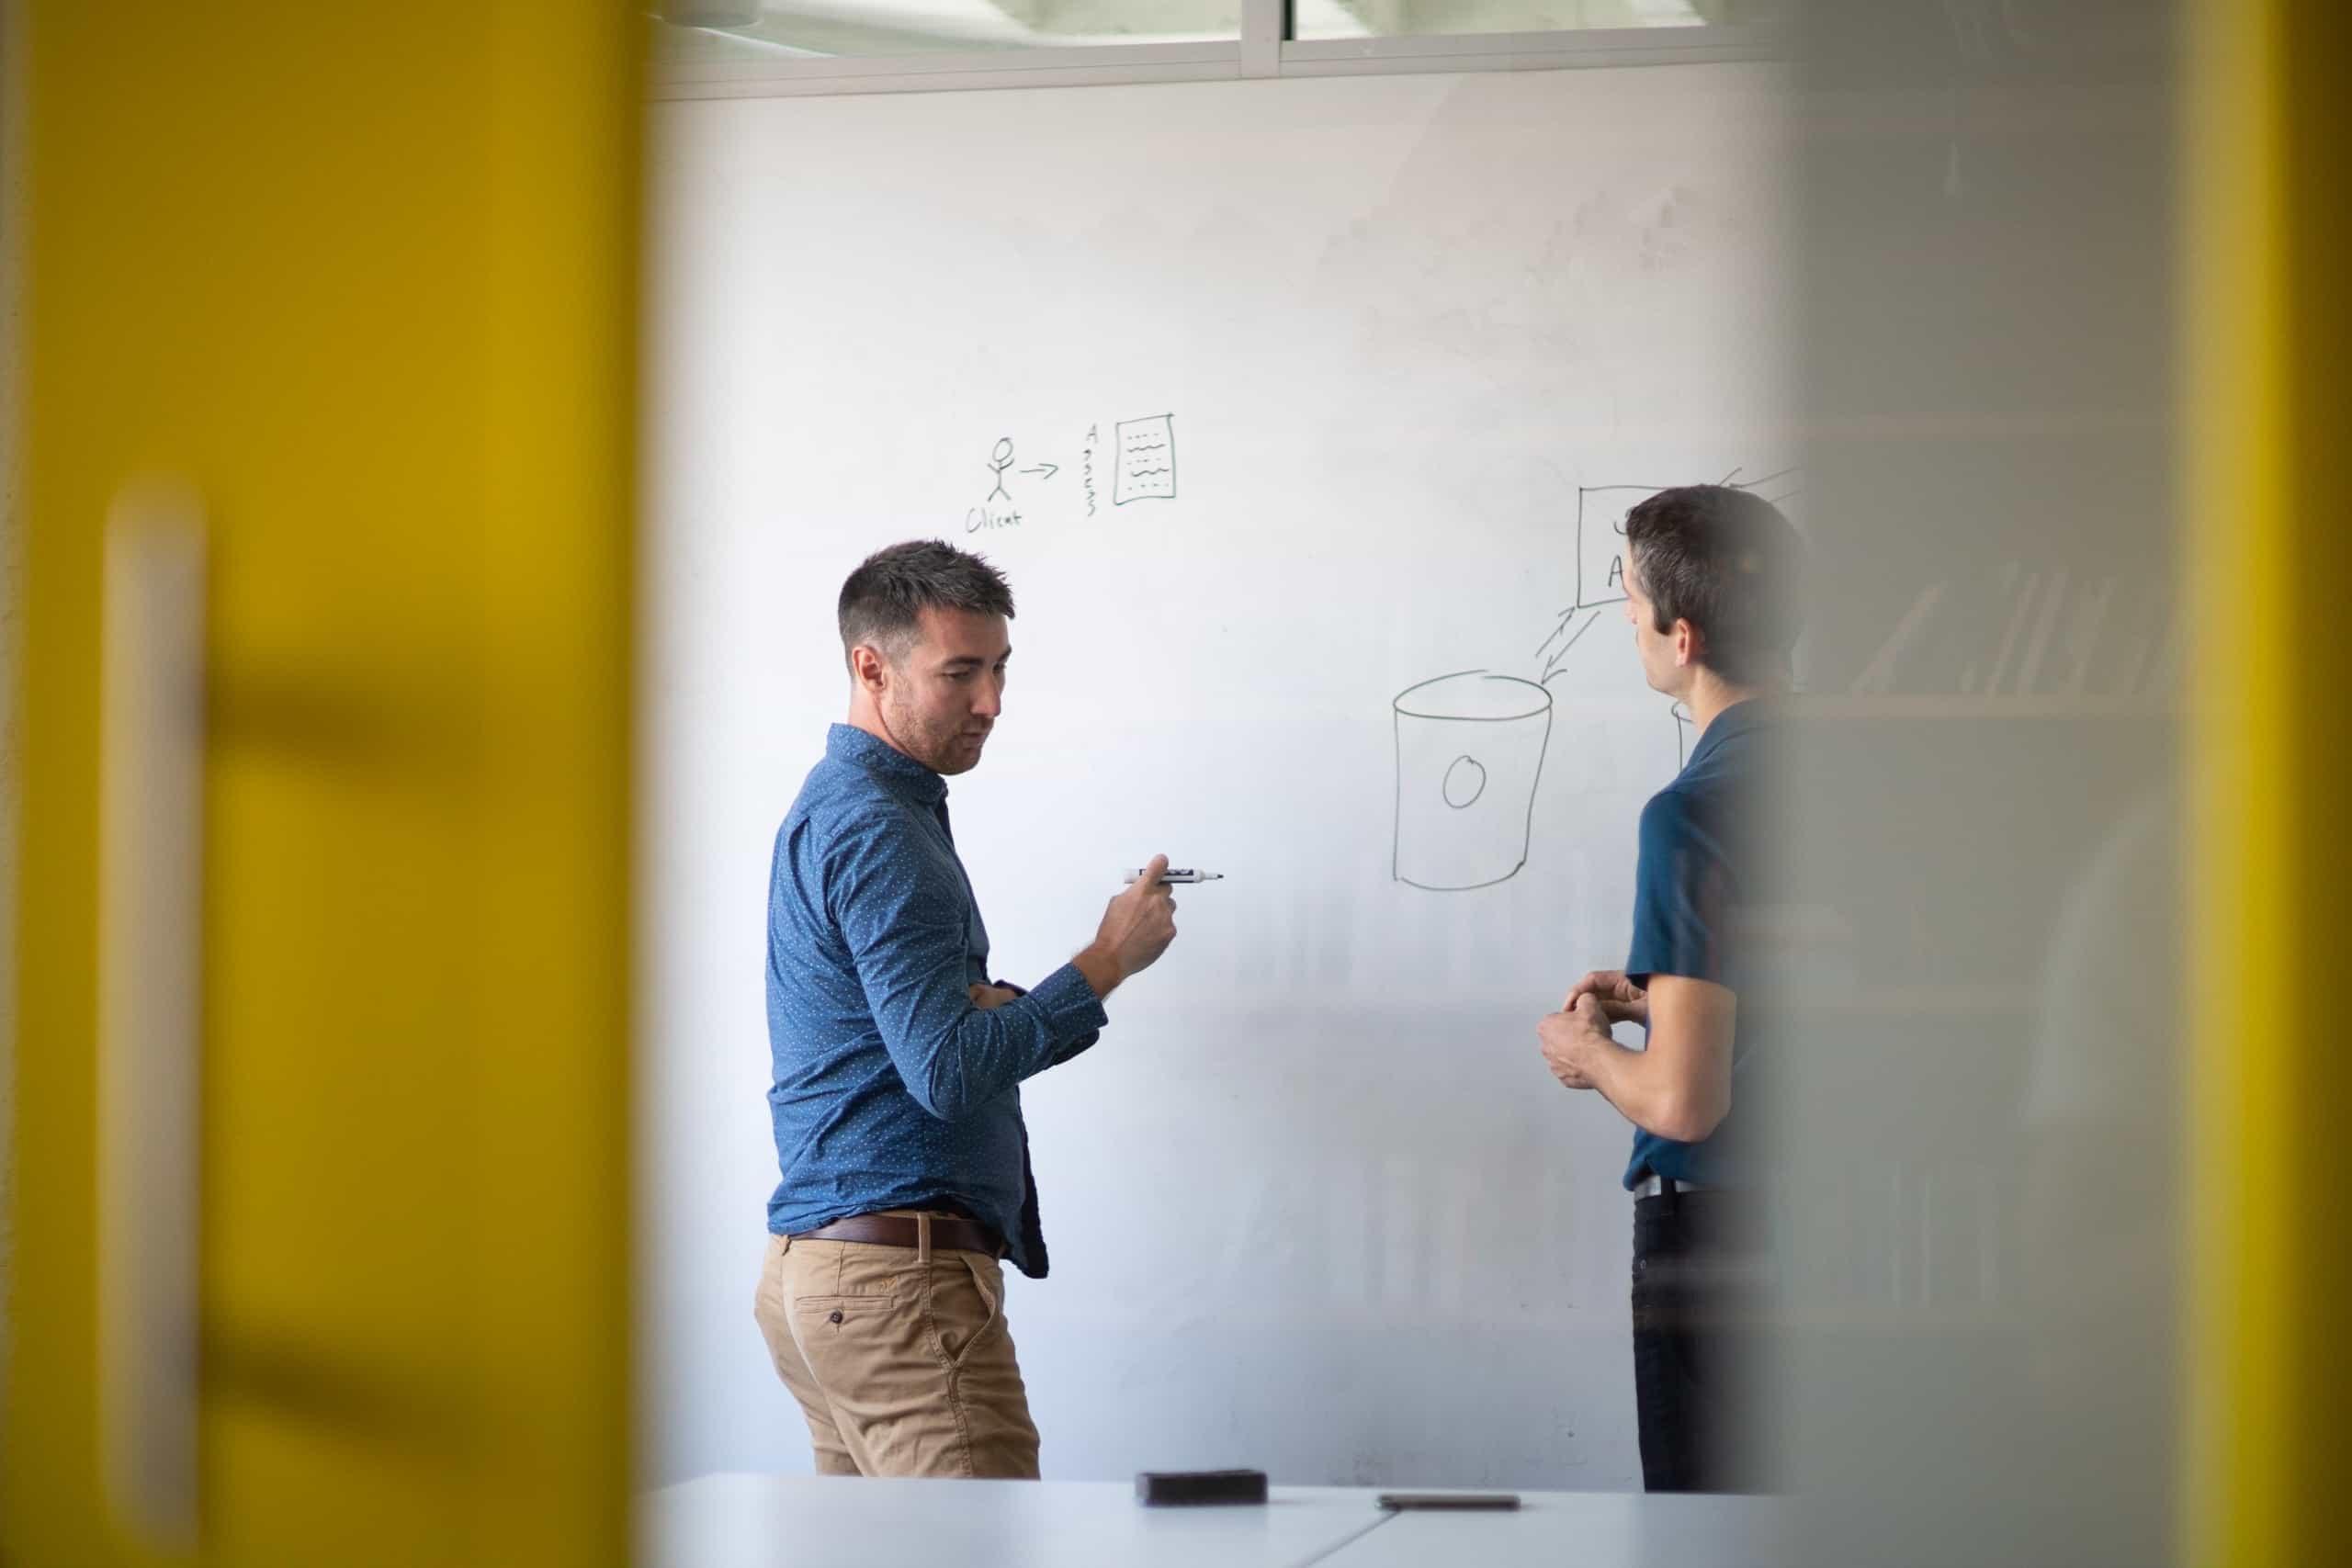 Medium shot of Luke Golden and Matt Campbell, Whiteboard employees, conferring in front of a whiteboard.